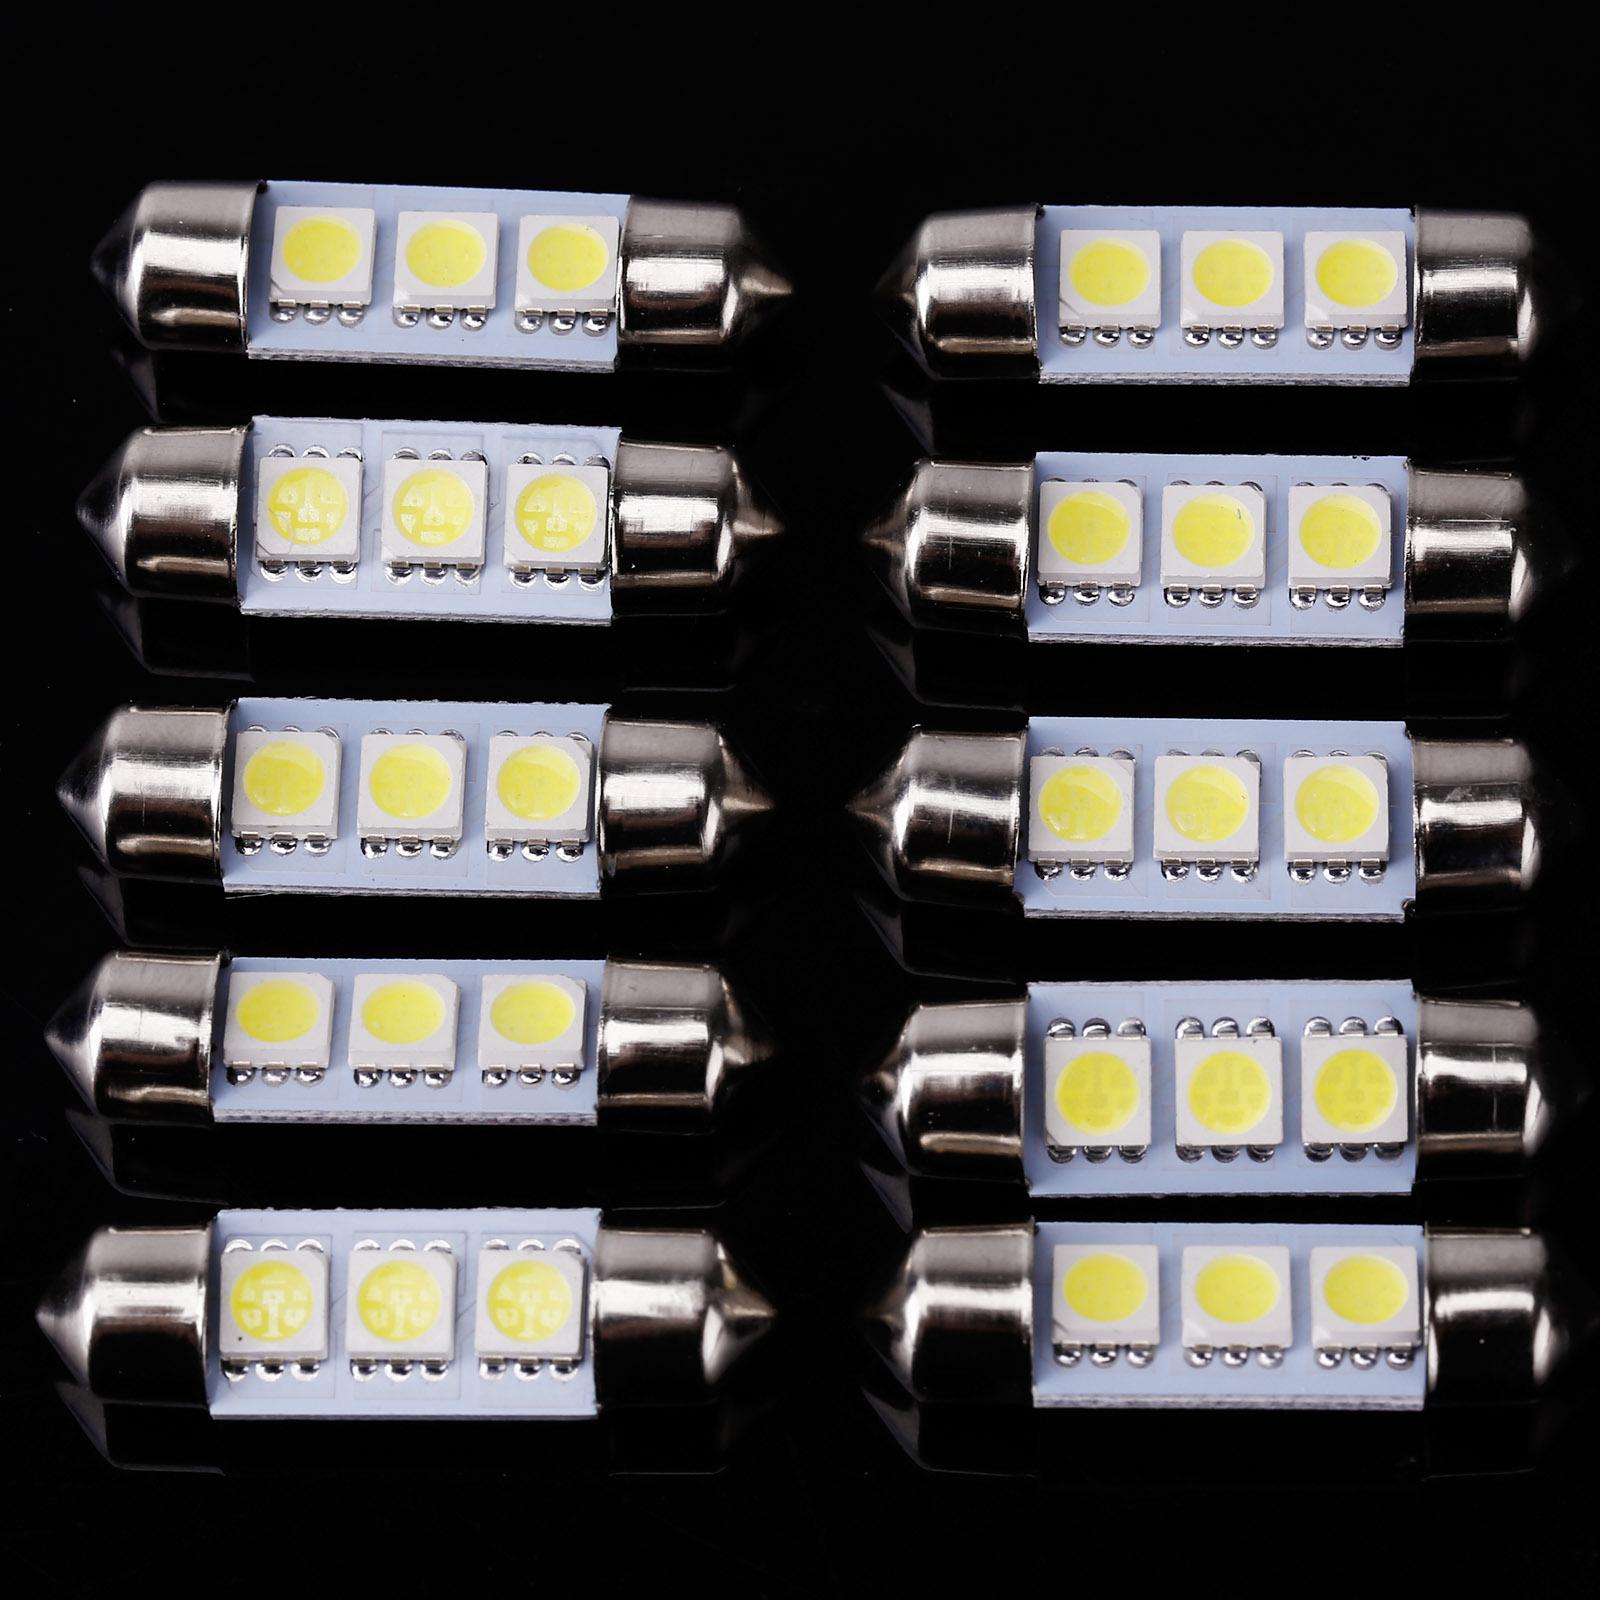 aa985_g3 Wunderbar Led Lampen Auto Innenraum Dekorationen